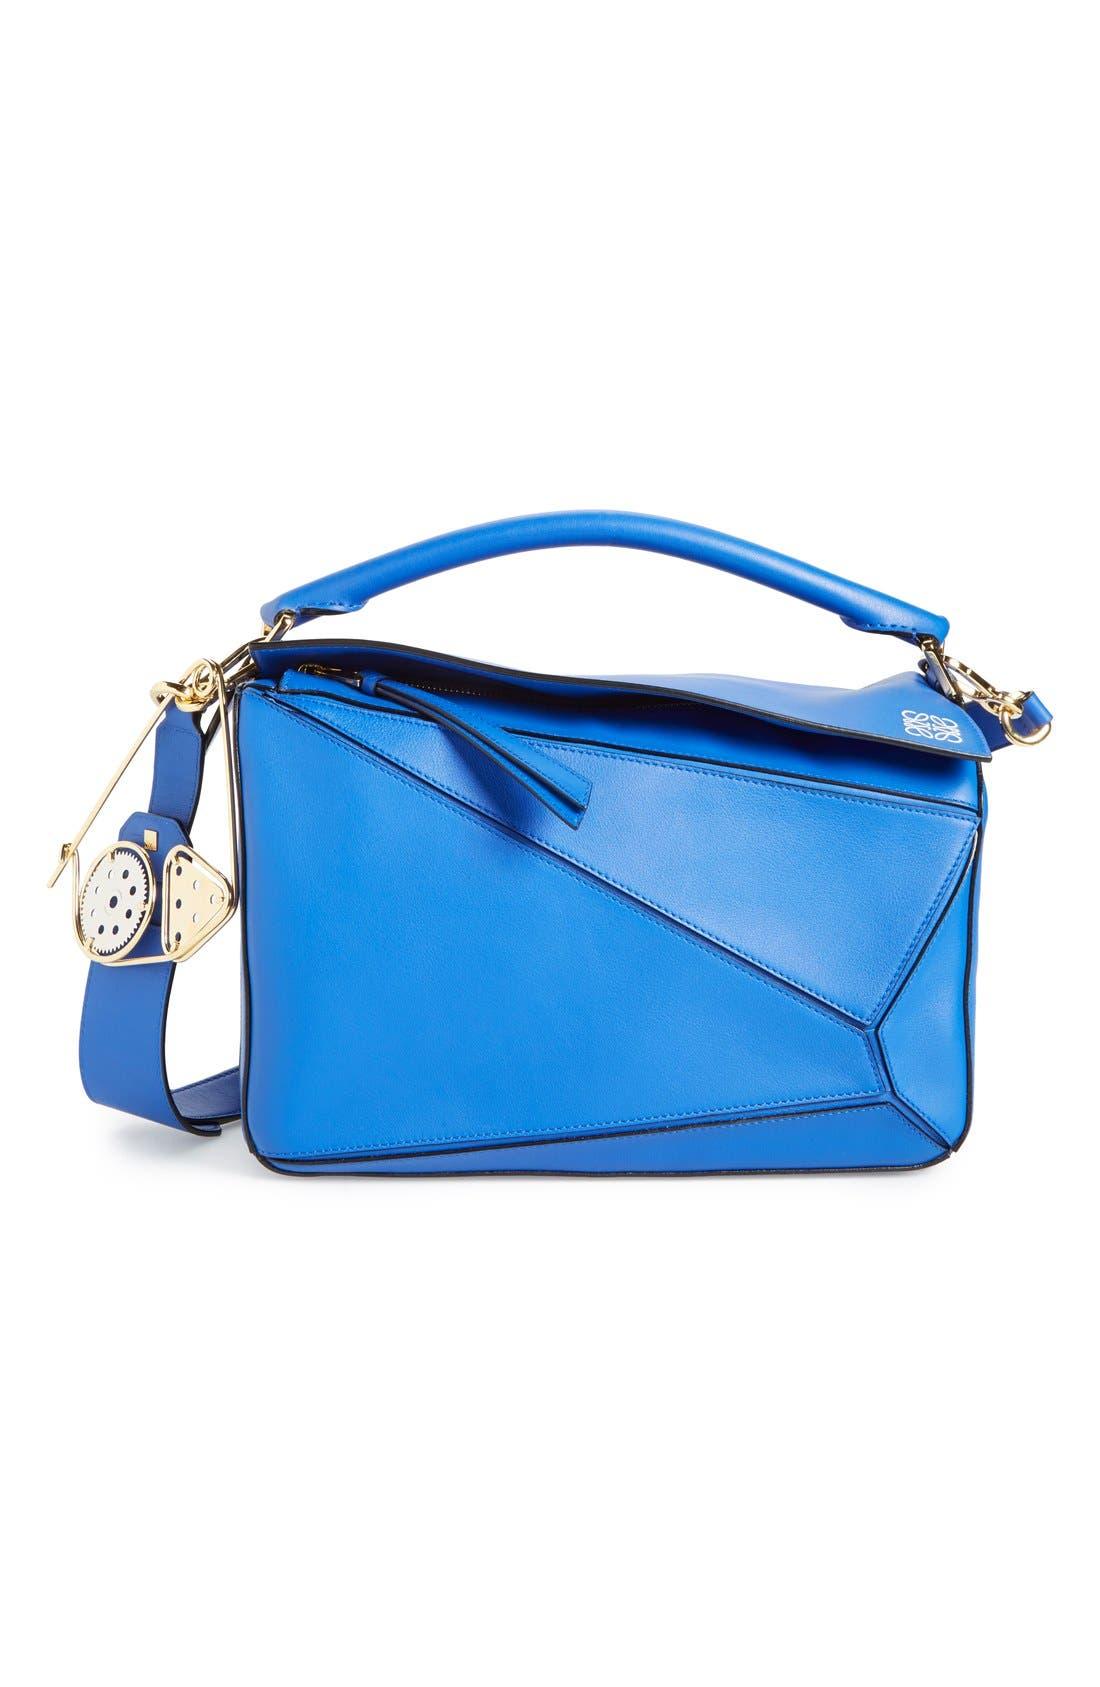 'Meccano' Double Pin Bag Charm,                             Alternate thumbnail 2, color,                             710